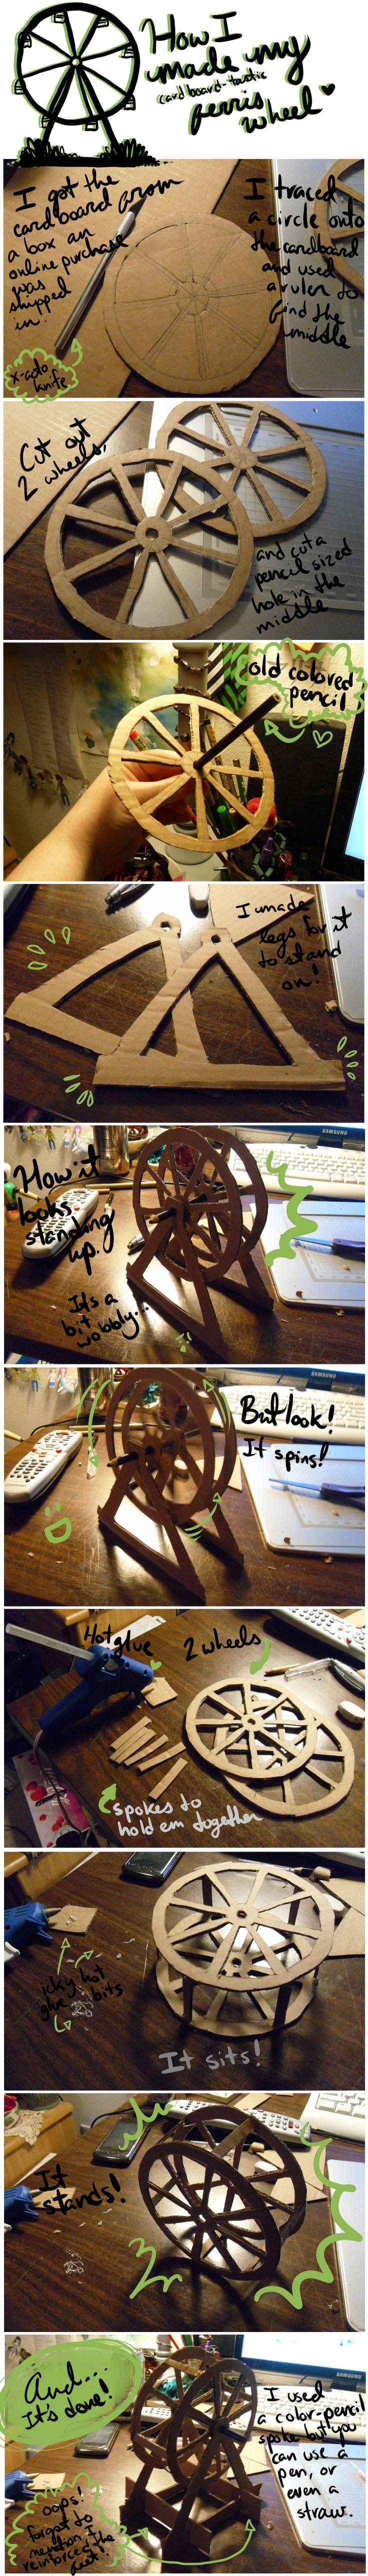 Cardboard Ferris Wheel by CrimsonPearls.deviantart.com on @DeviantArt